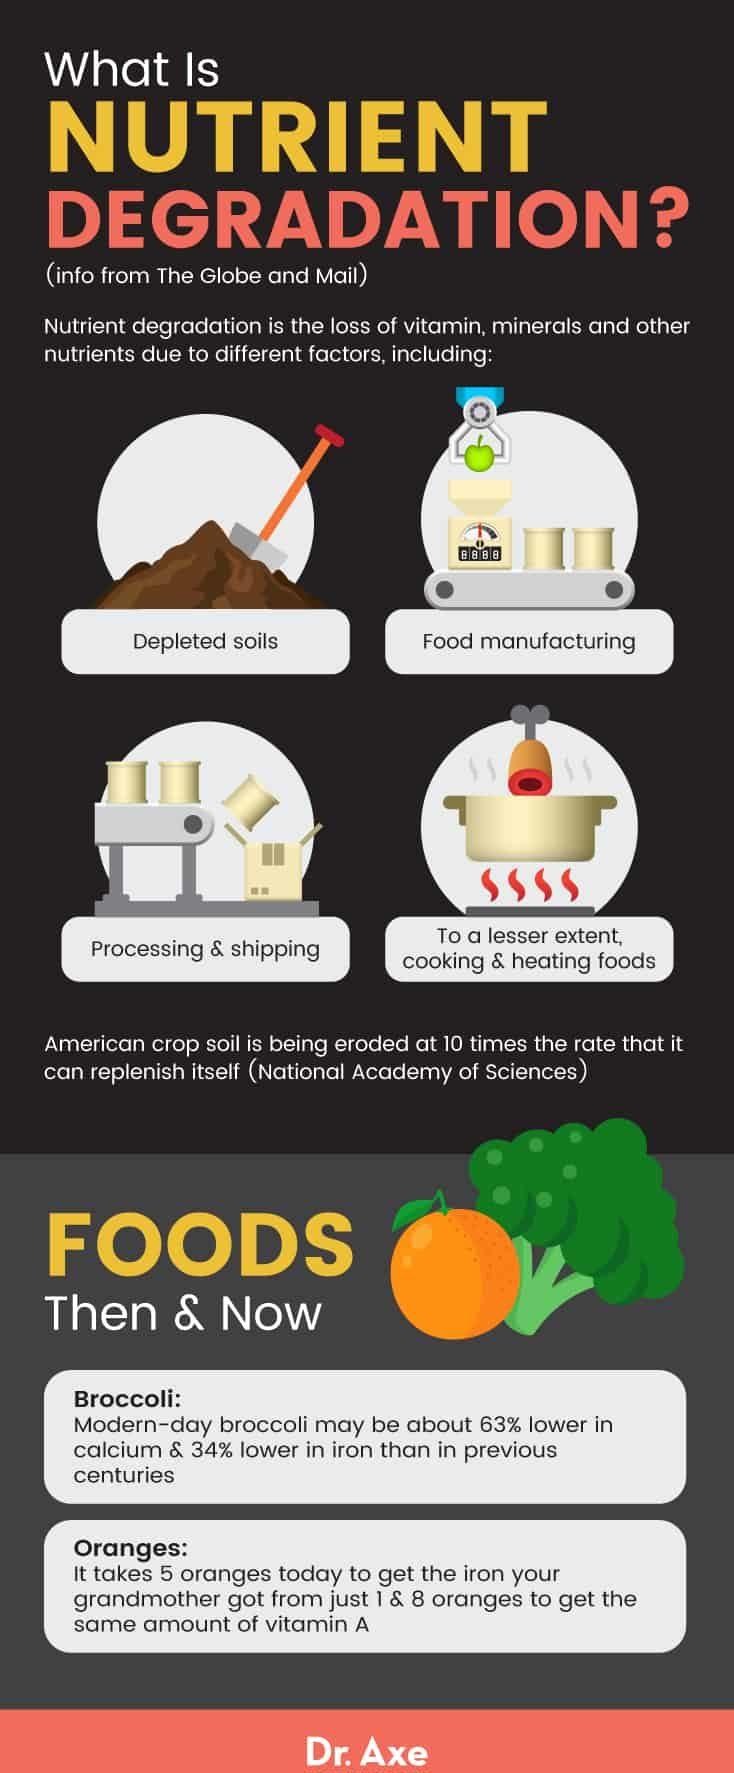 Nutrient degradation - Dr. Axe